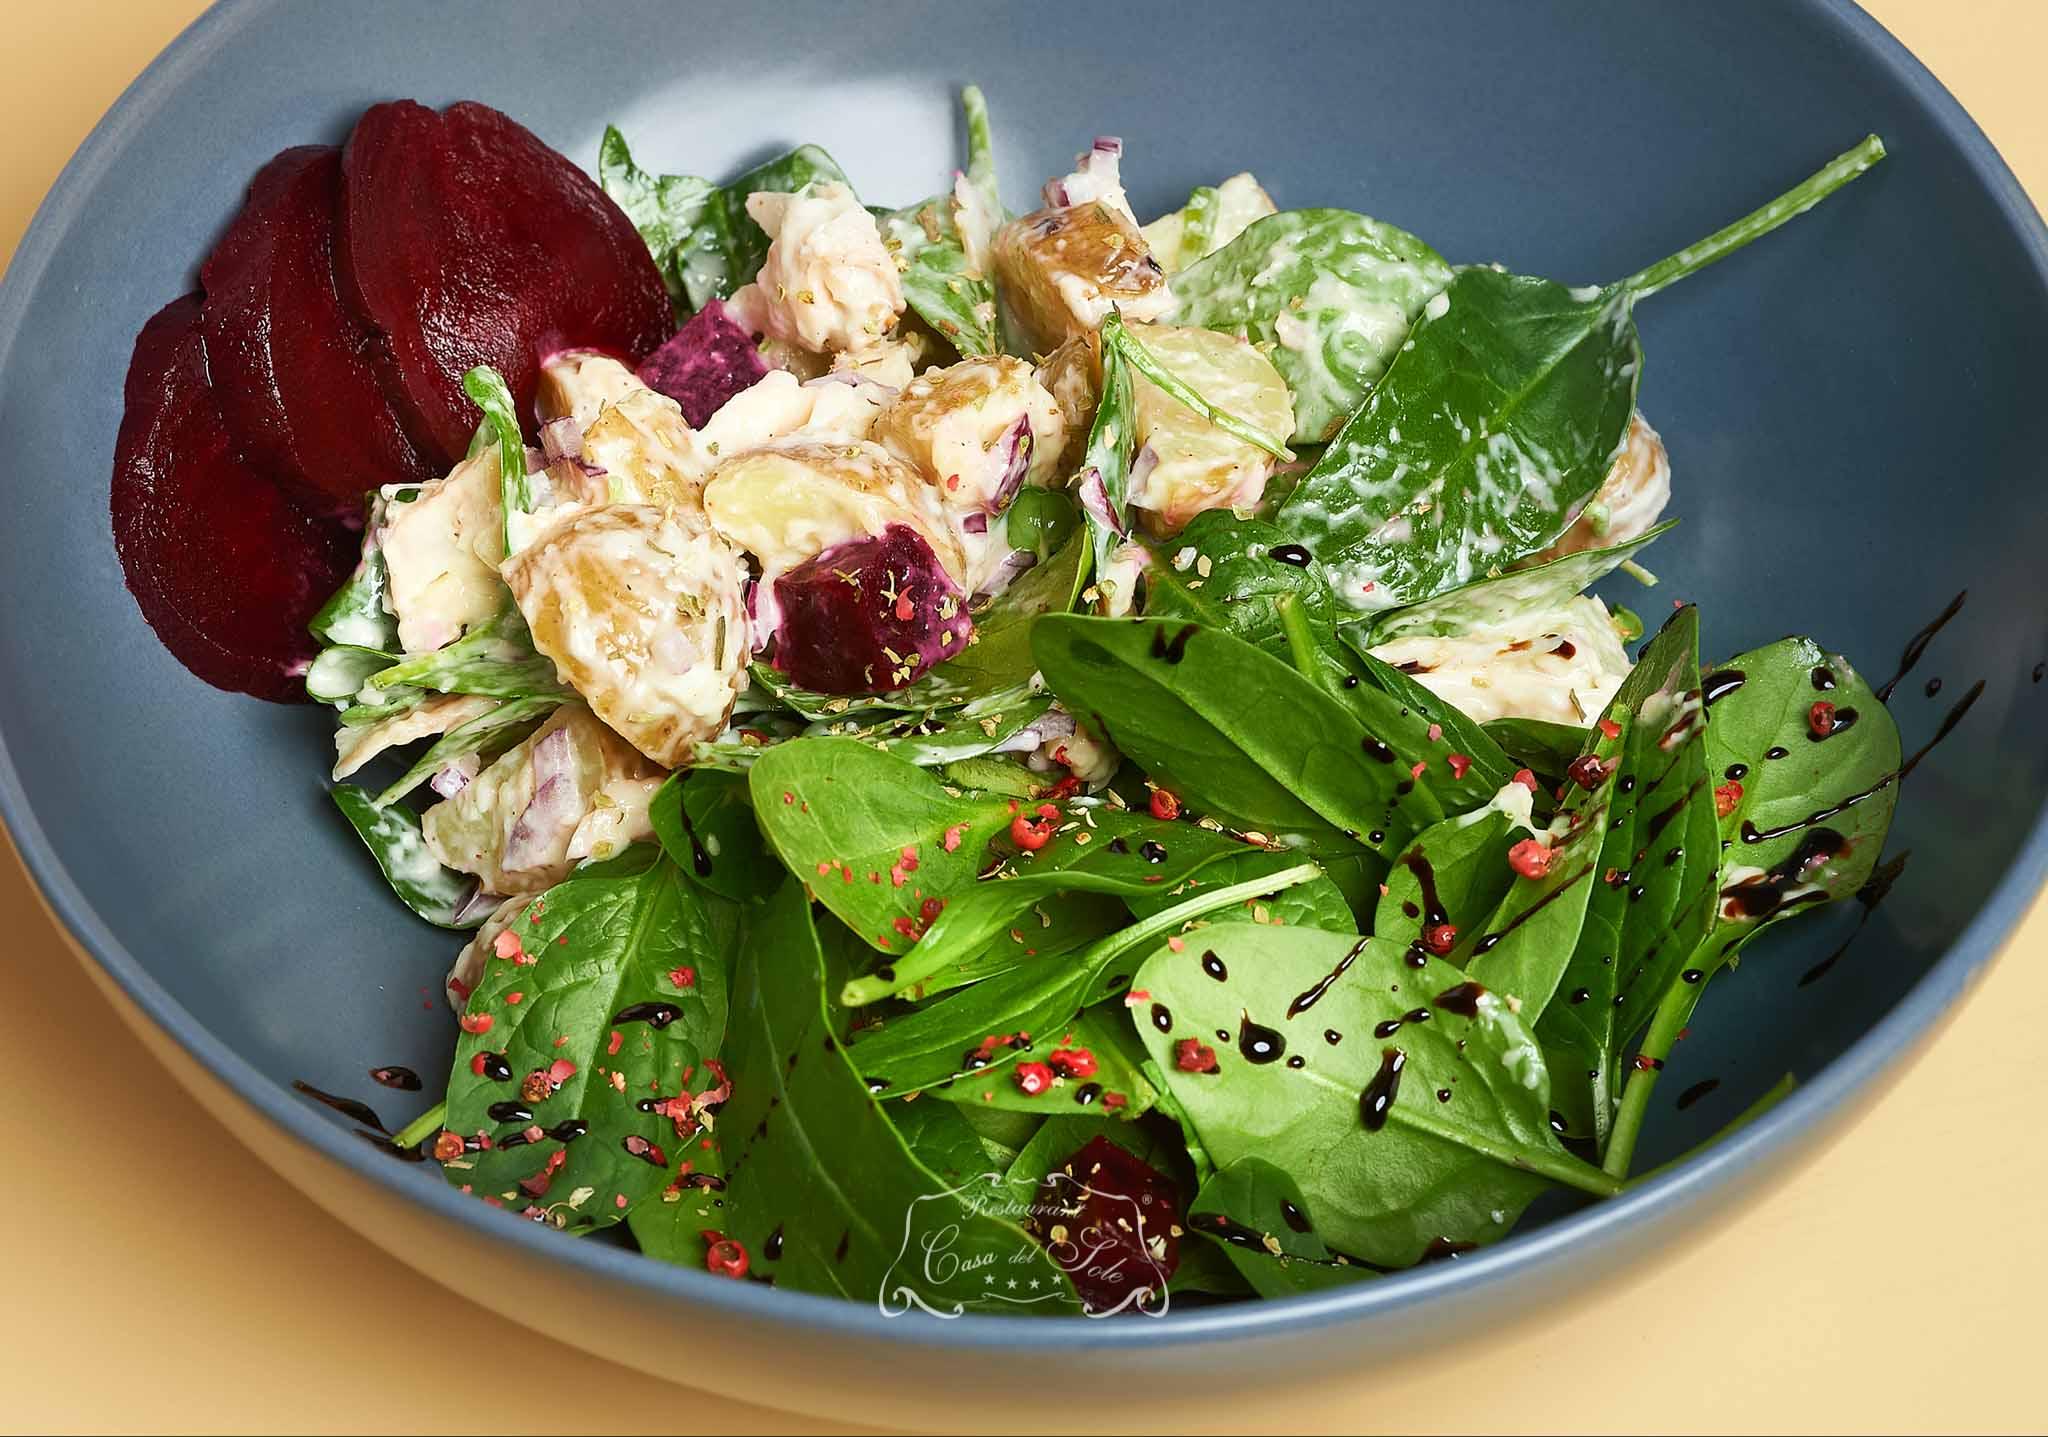 Livram la domiciliu Salata cu pastrav afumat si sfecla inabusita in Timisoara